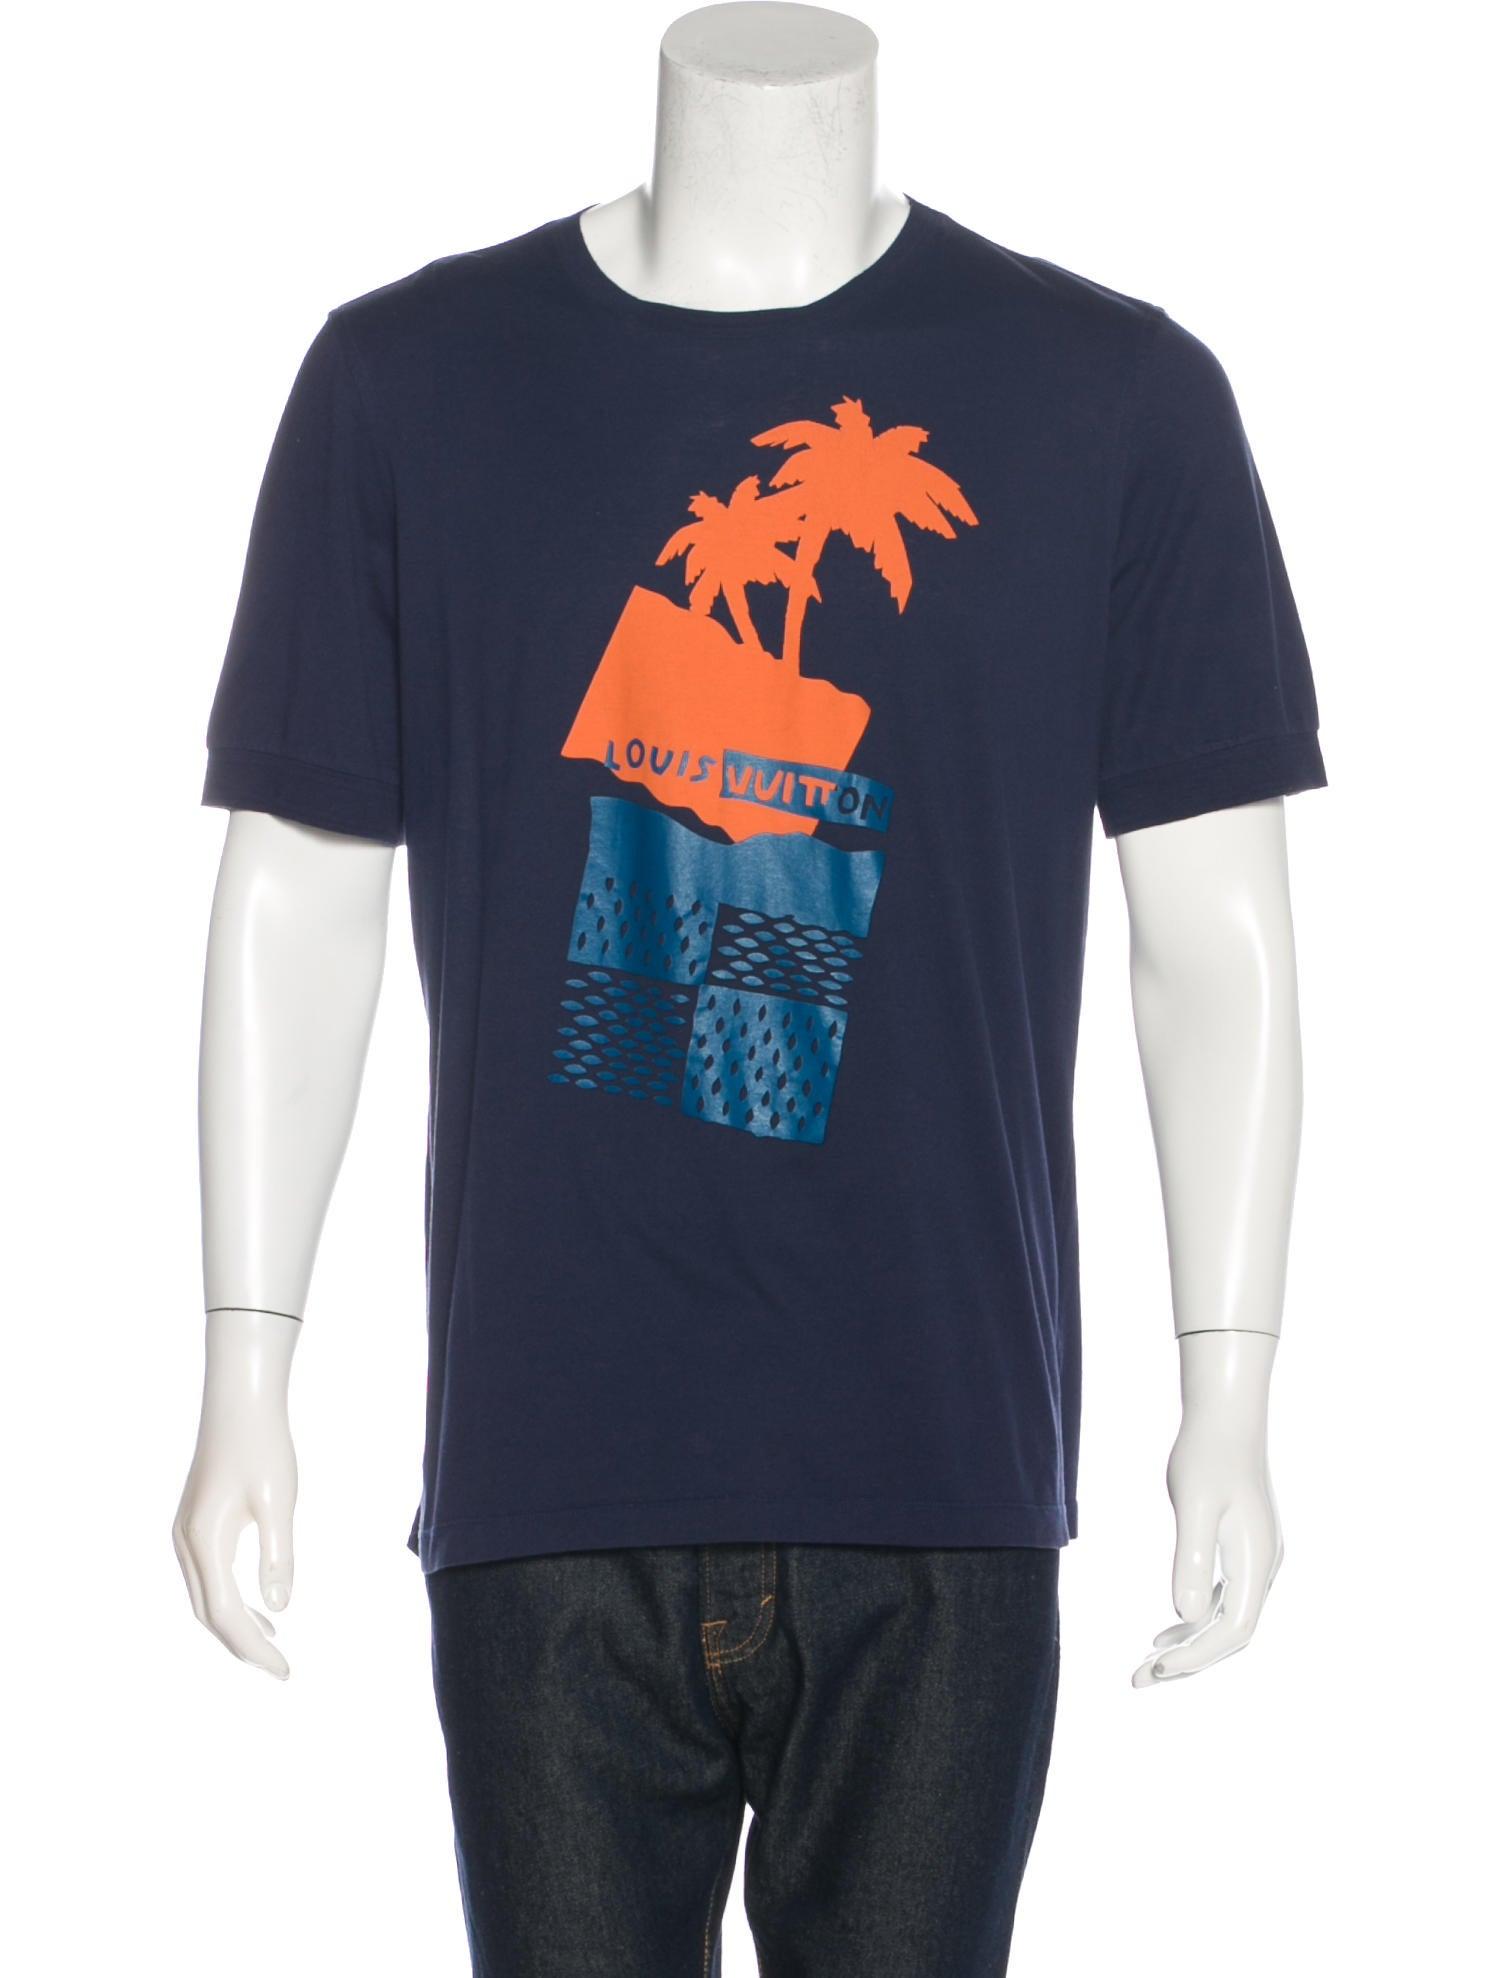 Louis vuitton graphic print t shirt clothing lou126194 for T shirt graphic printing